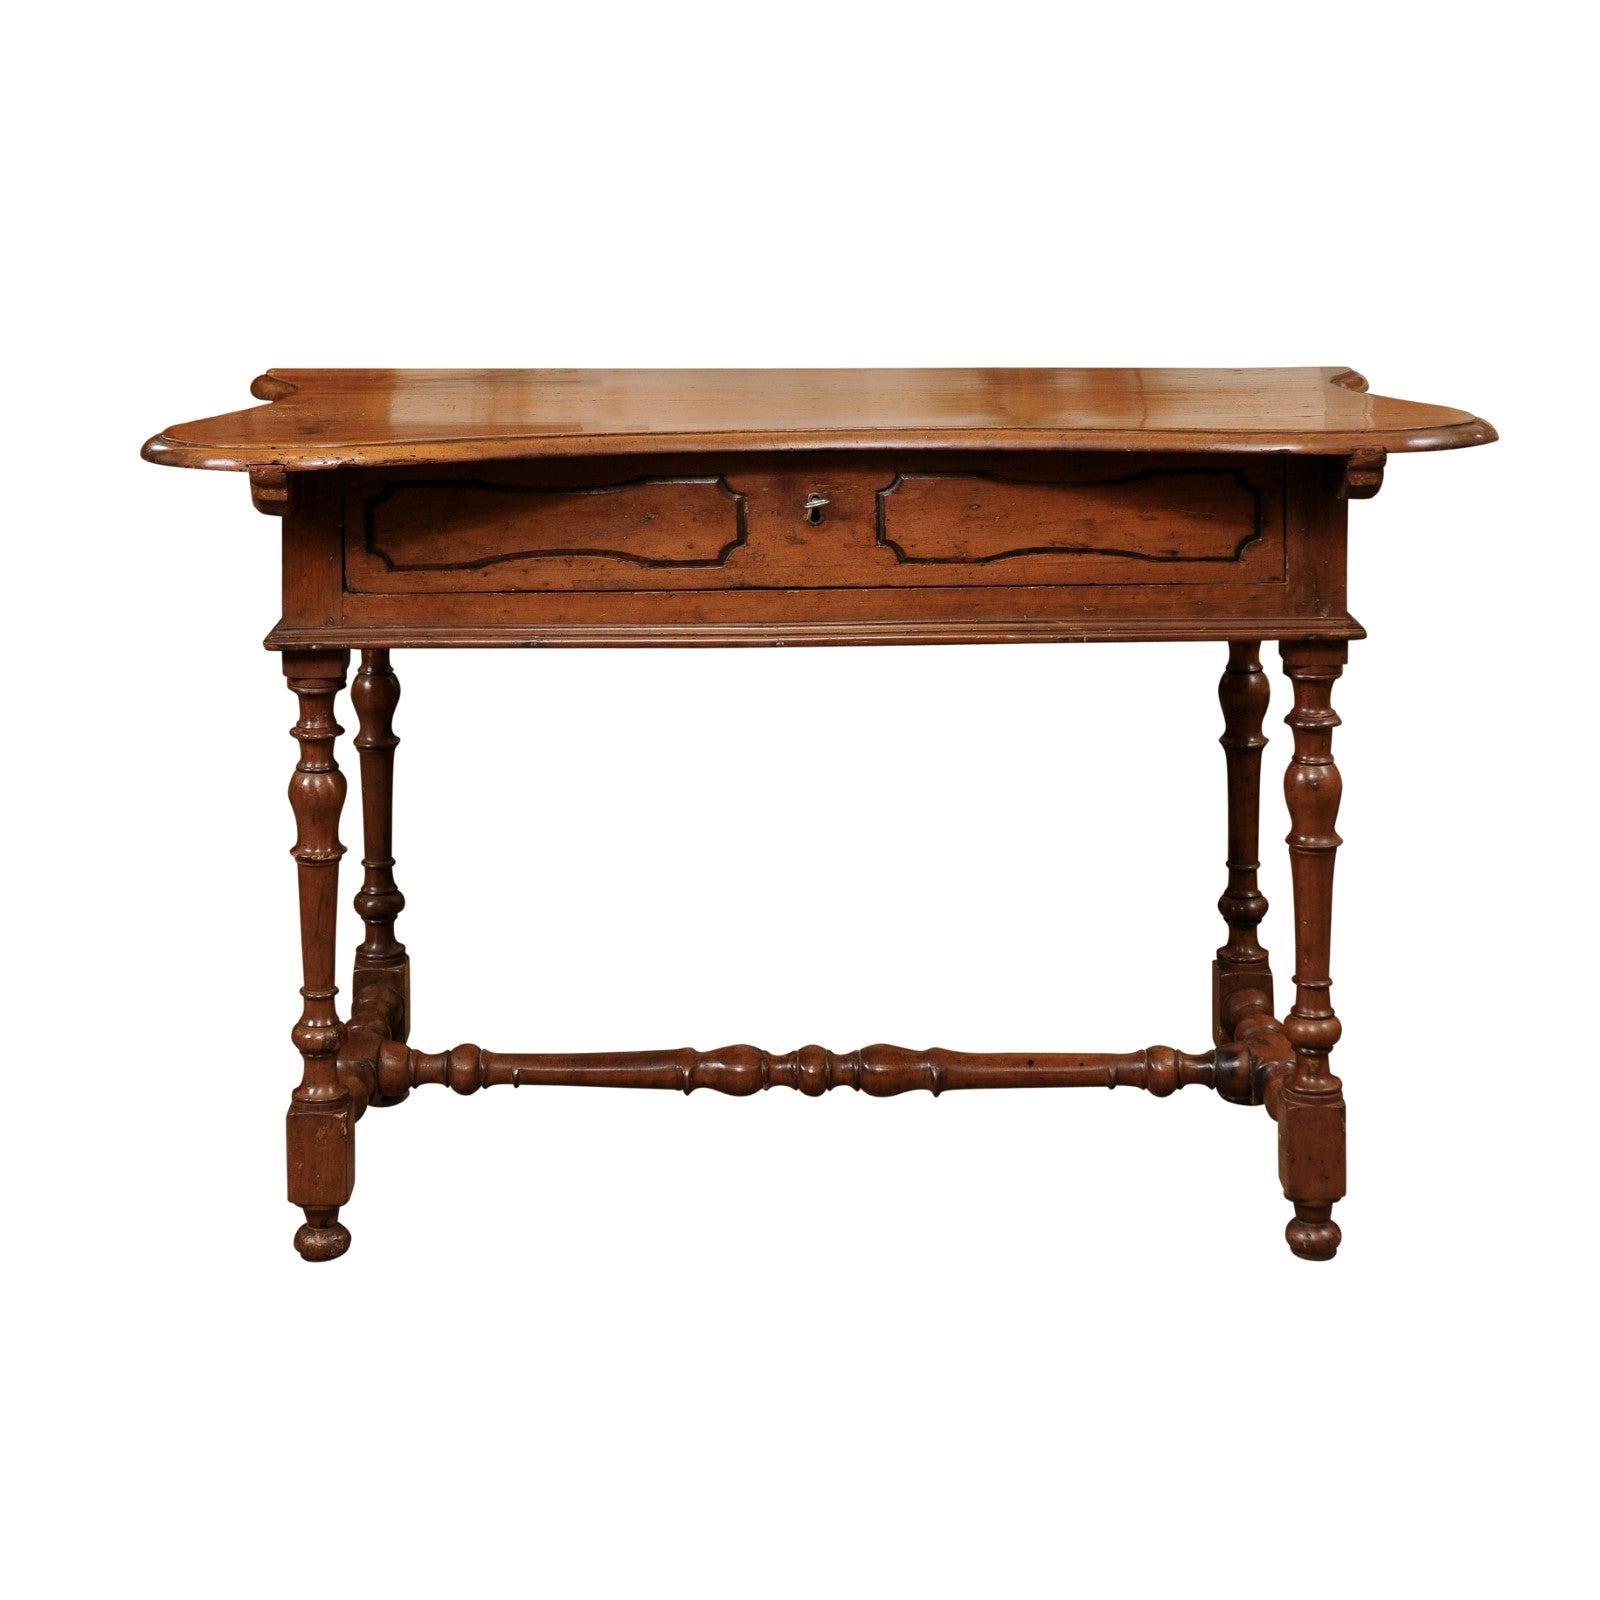 Italian Baroque Walnut Serpentine Console Table, Late 17th Century